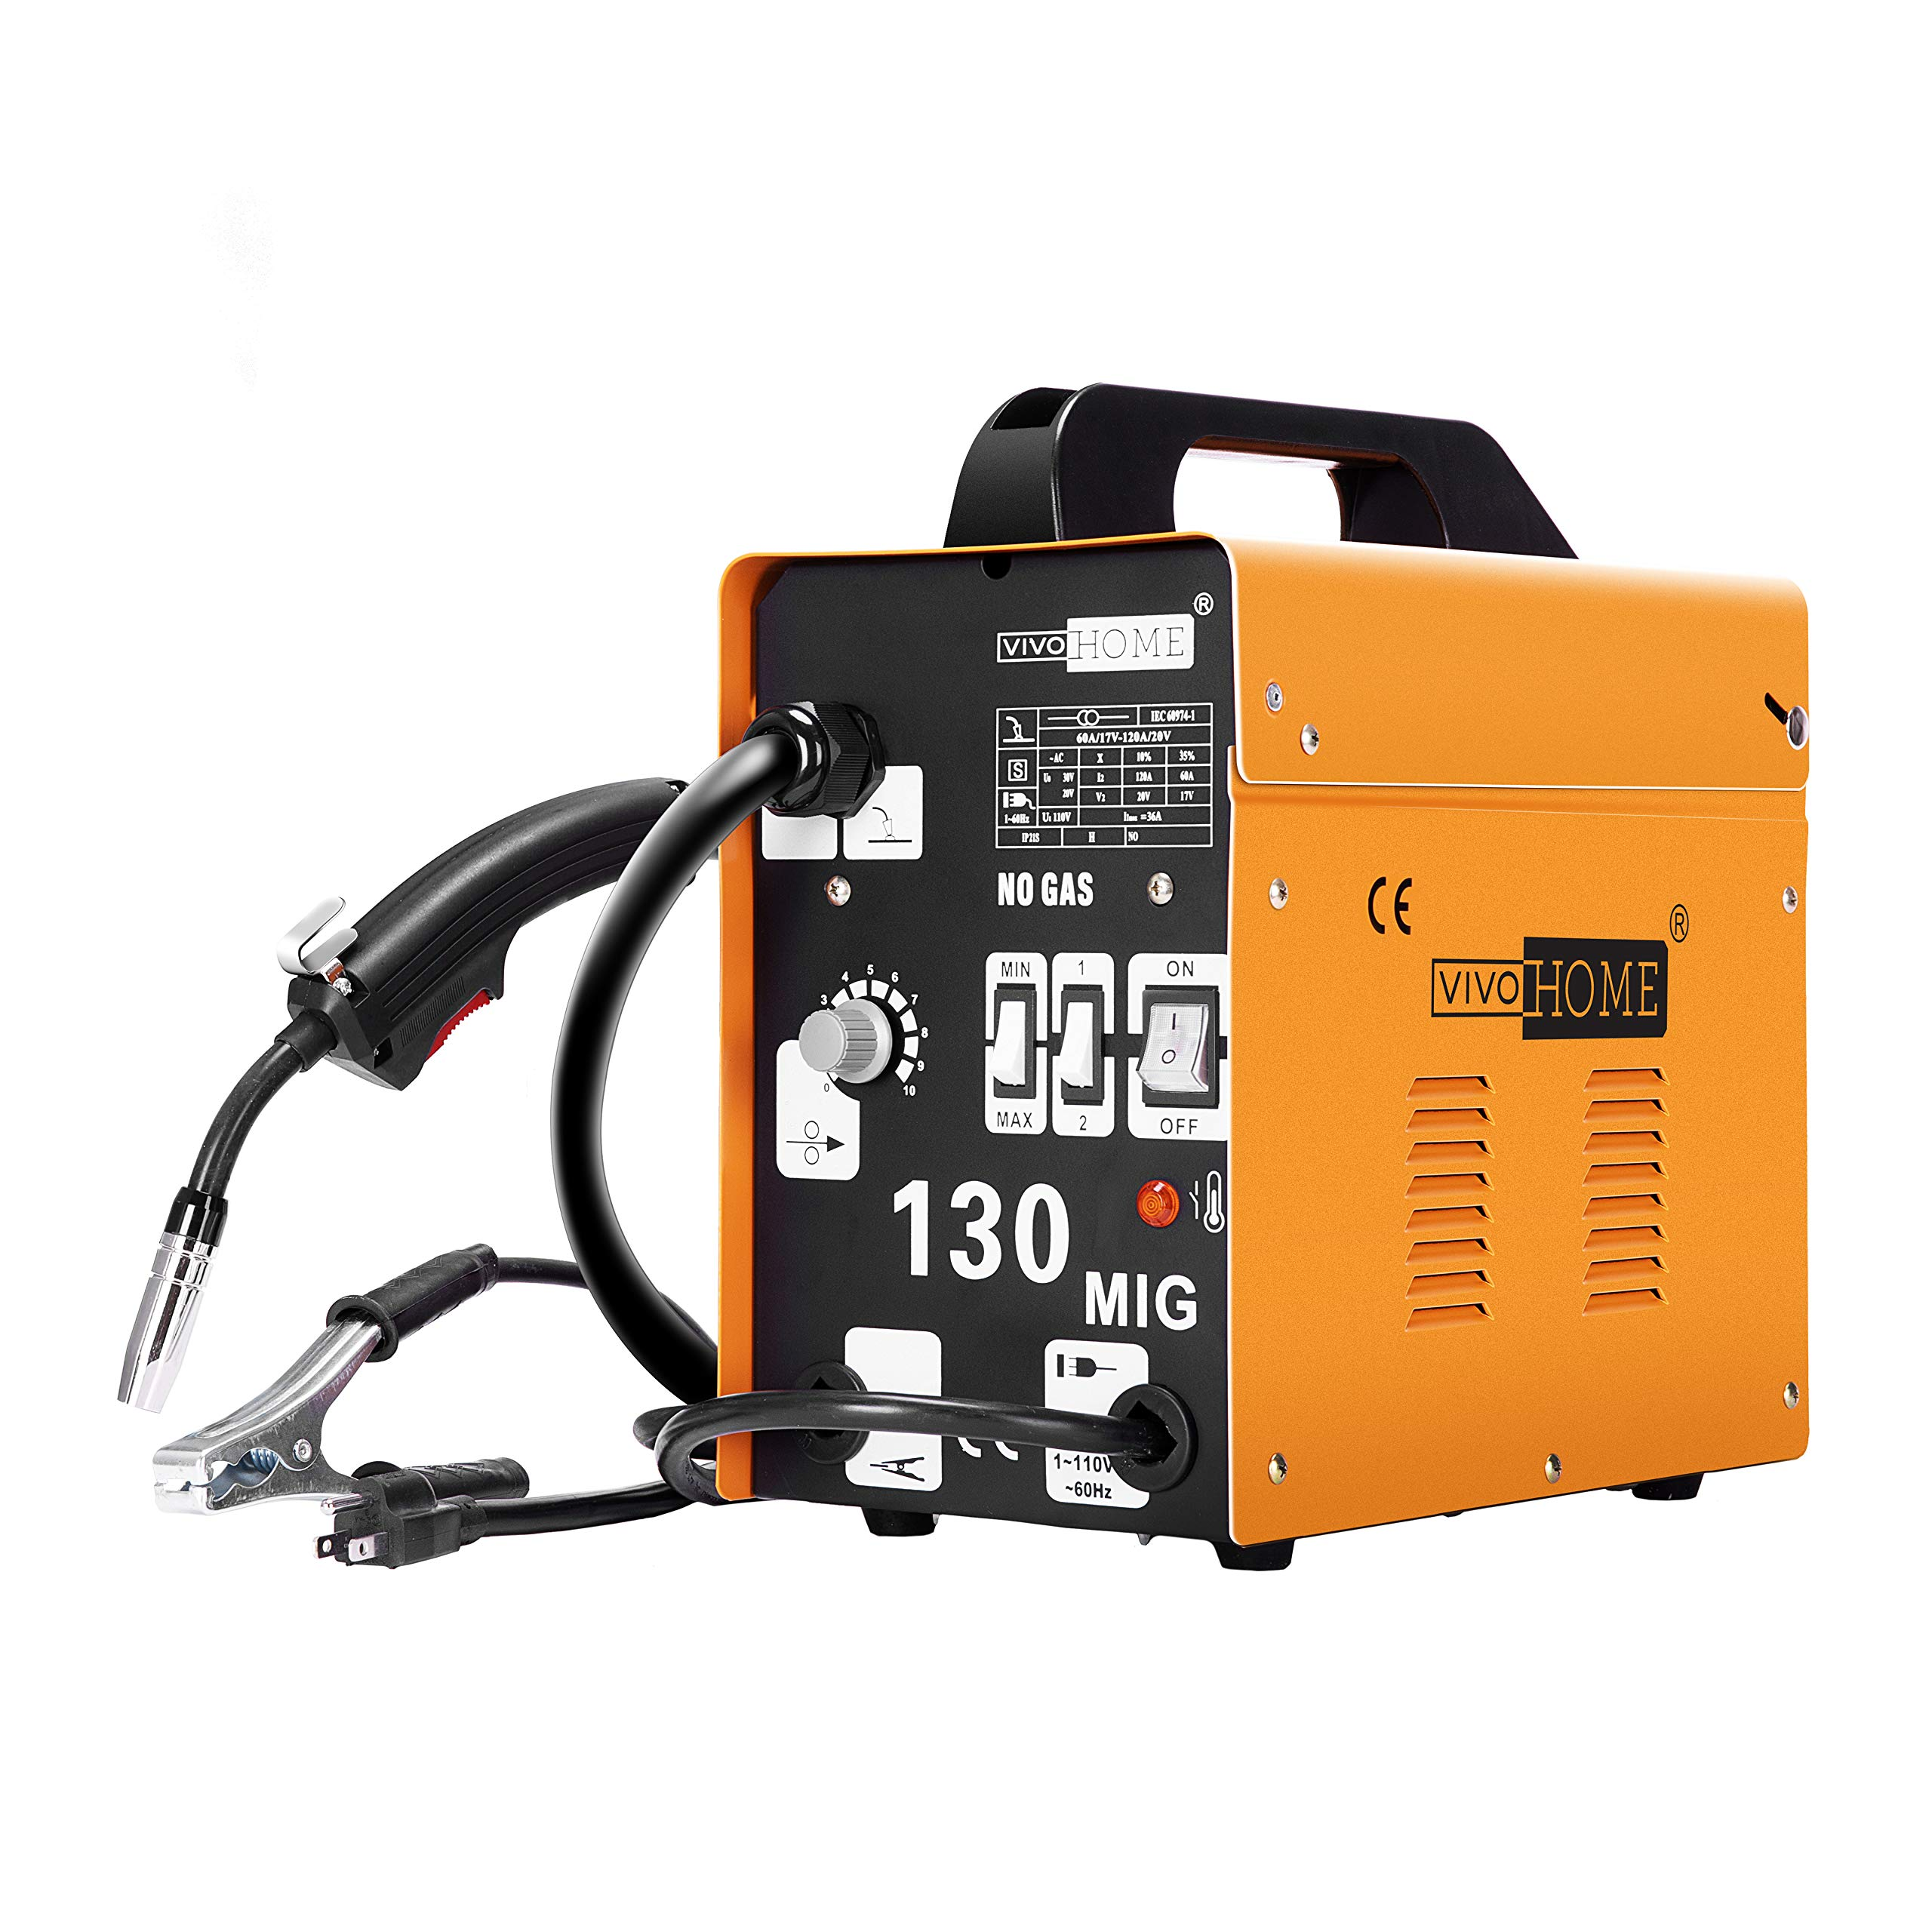 VIVOHOME Portable Flux Core Wire No Gas MIG 130 Welder Machine 110V